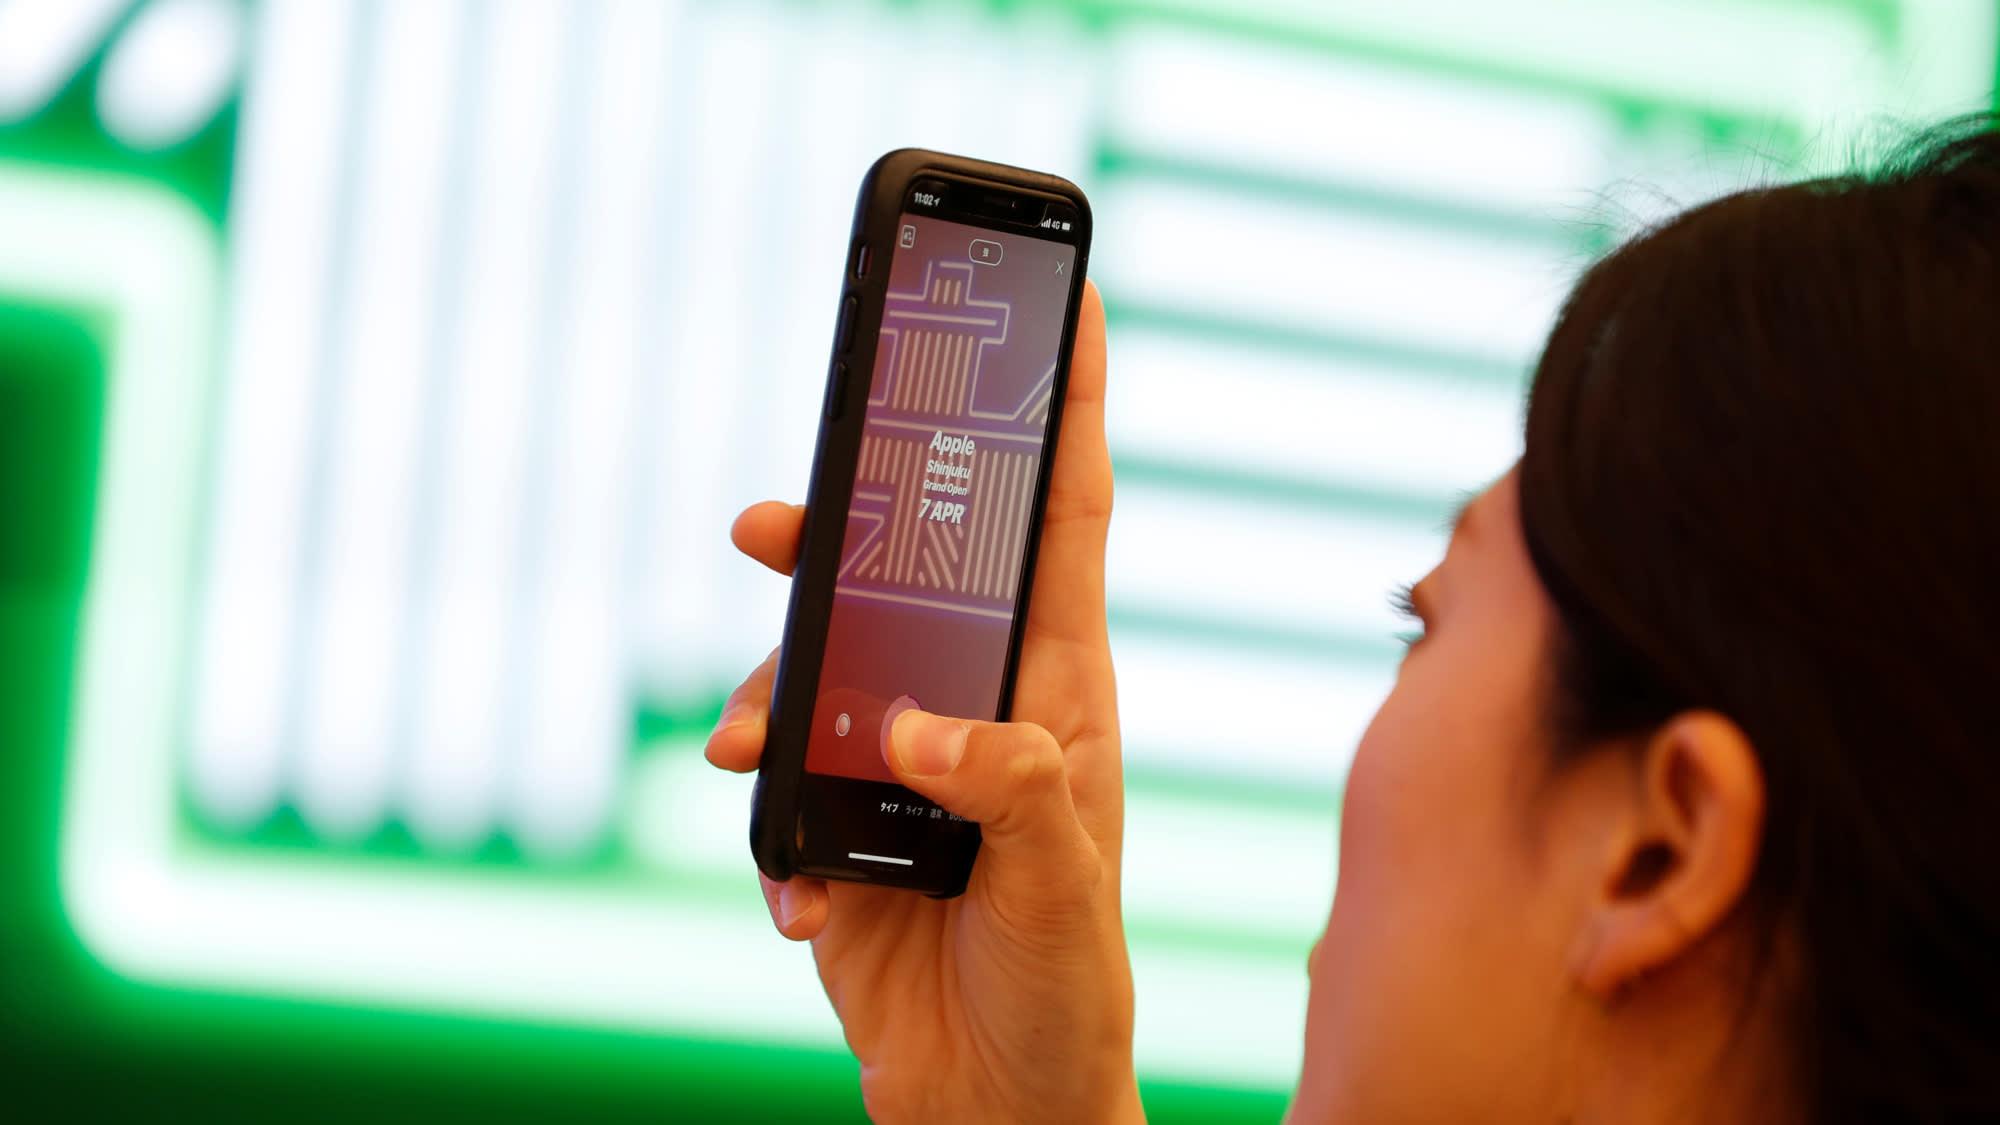 Apple supplier TSMC forecasts mobile revenue drop for 2018 ...